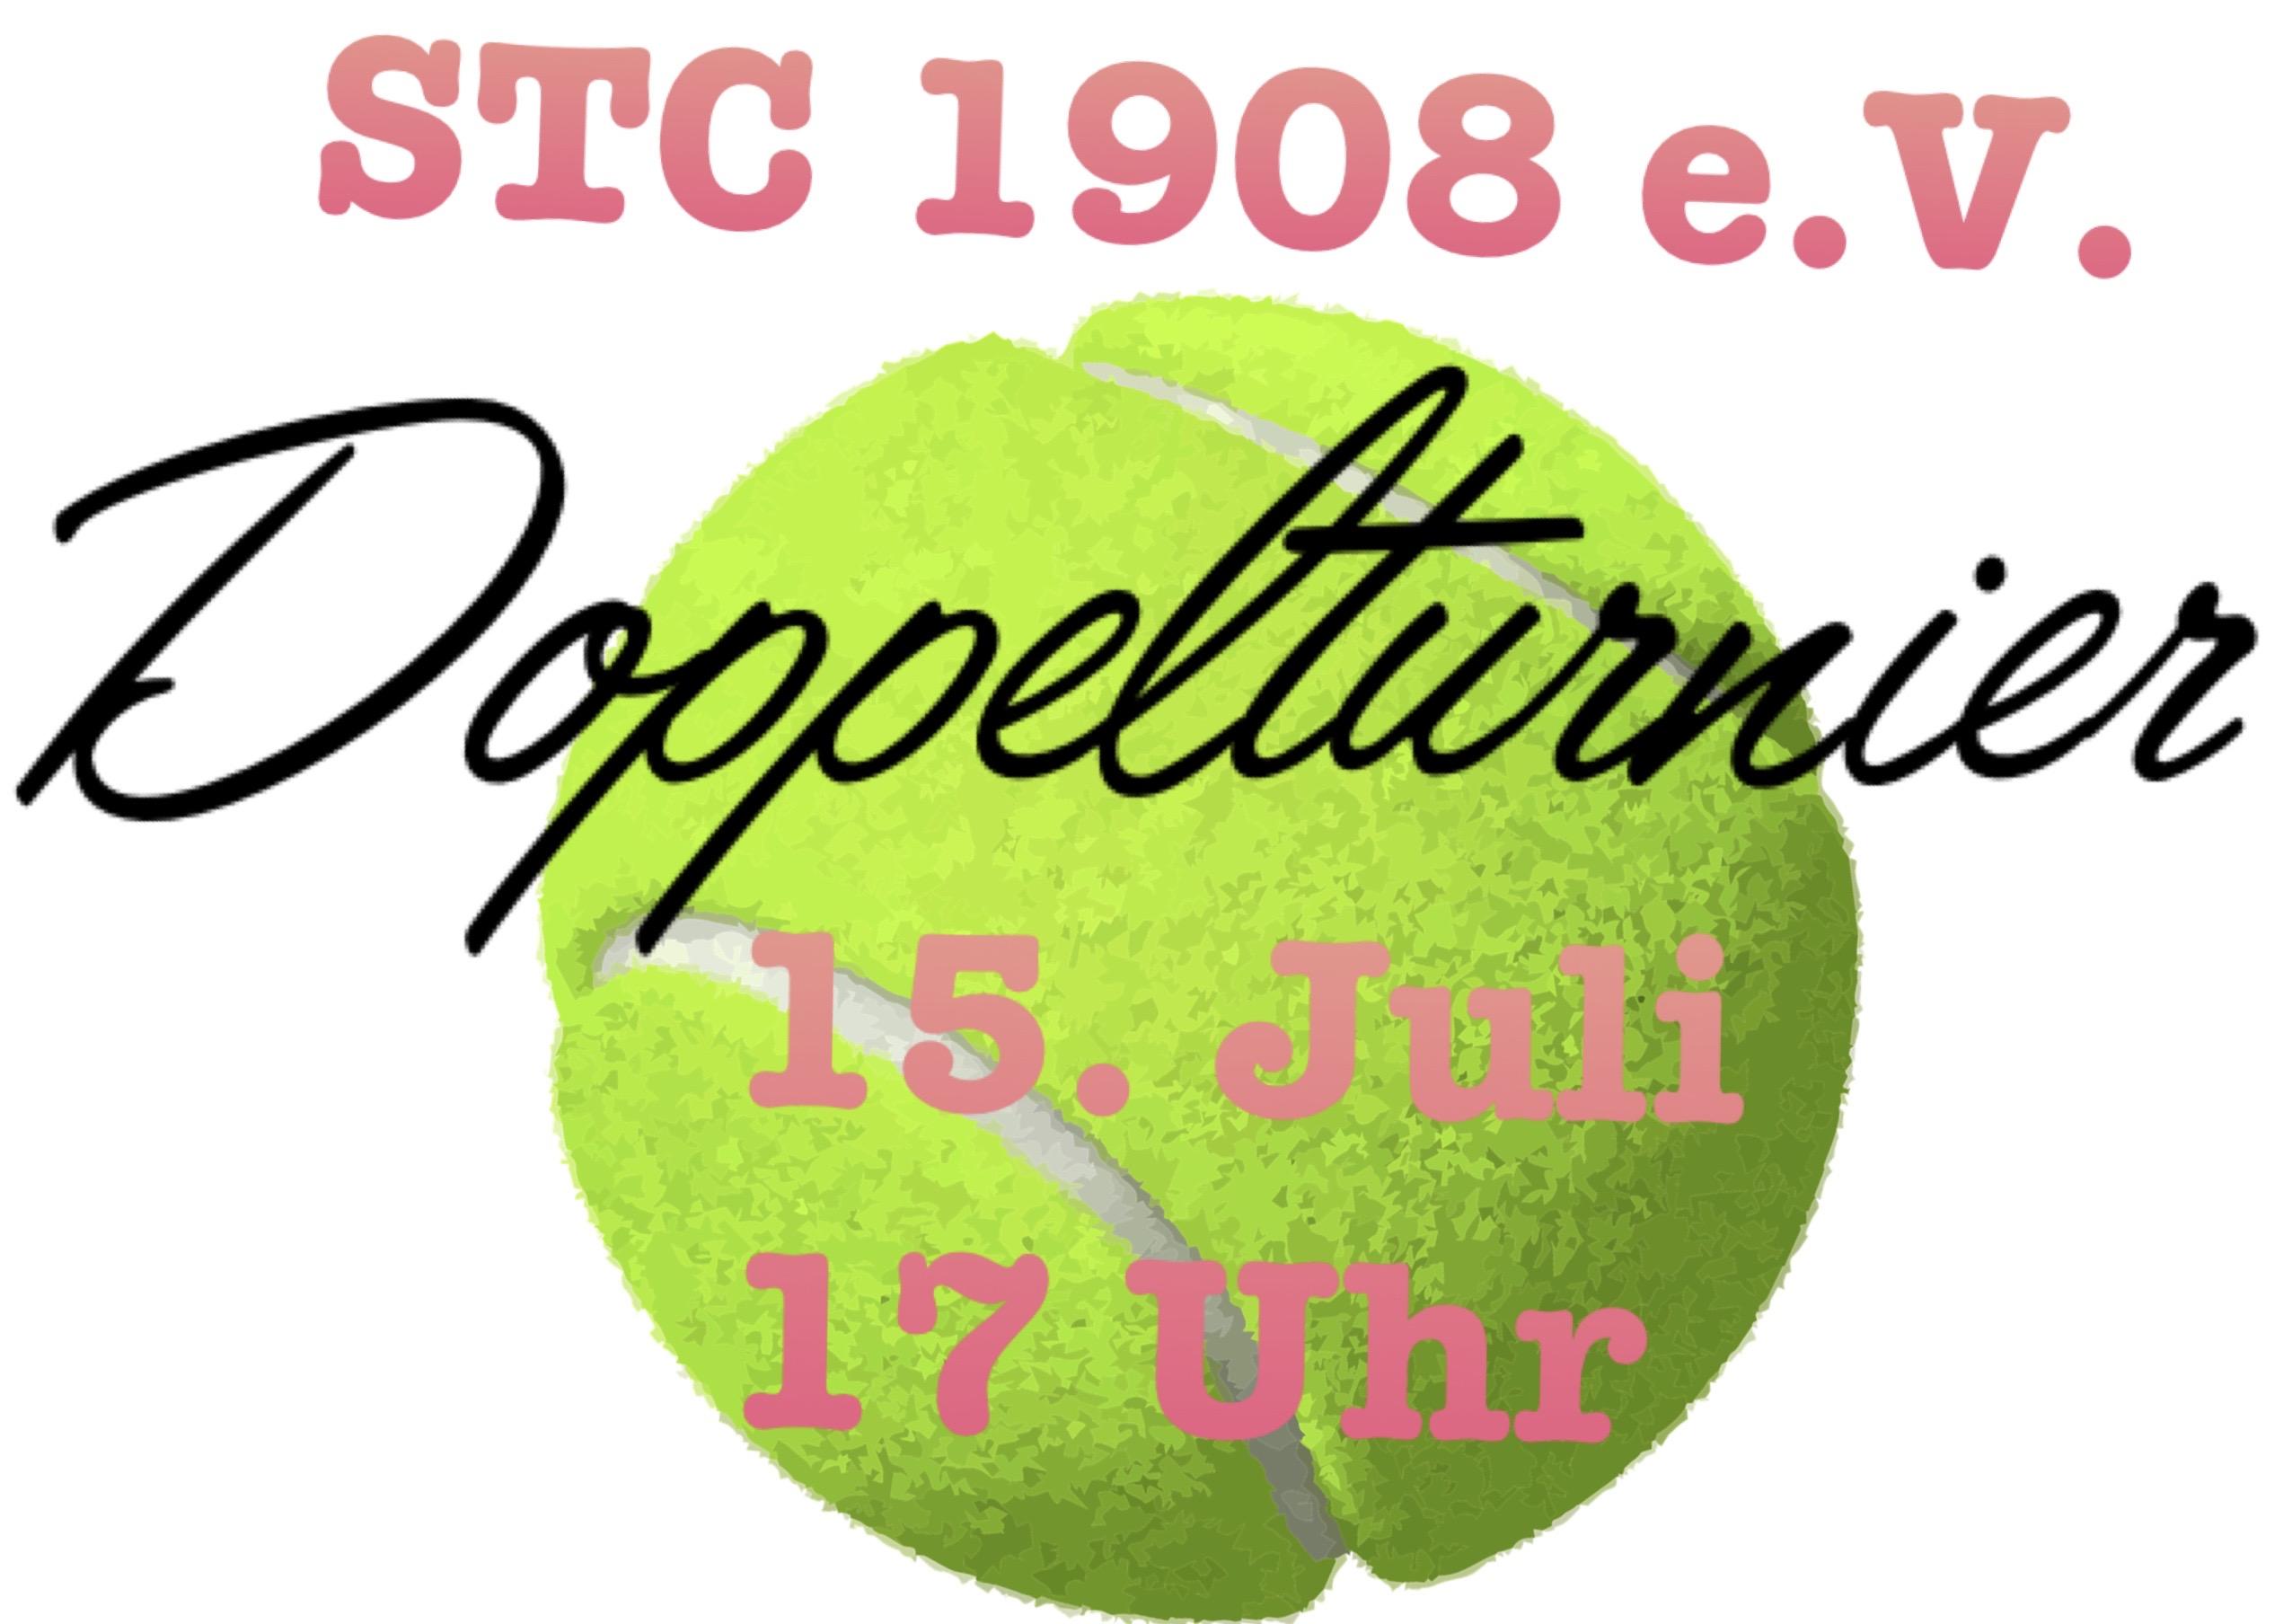 Feierabend-Doppelturnier am 15.7.20